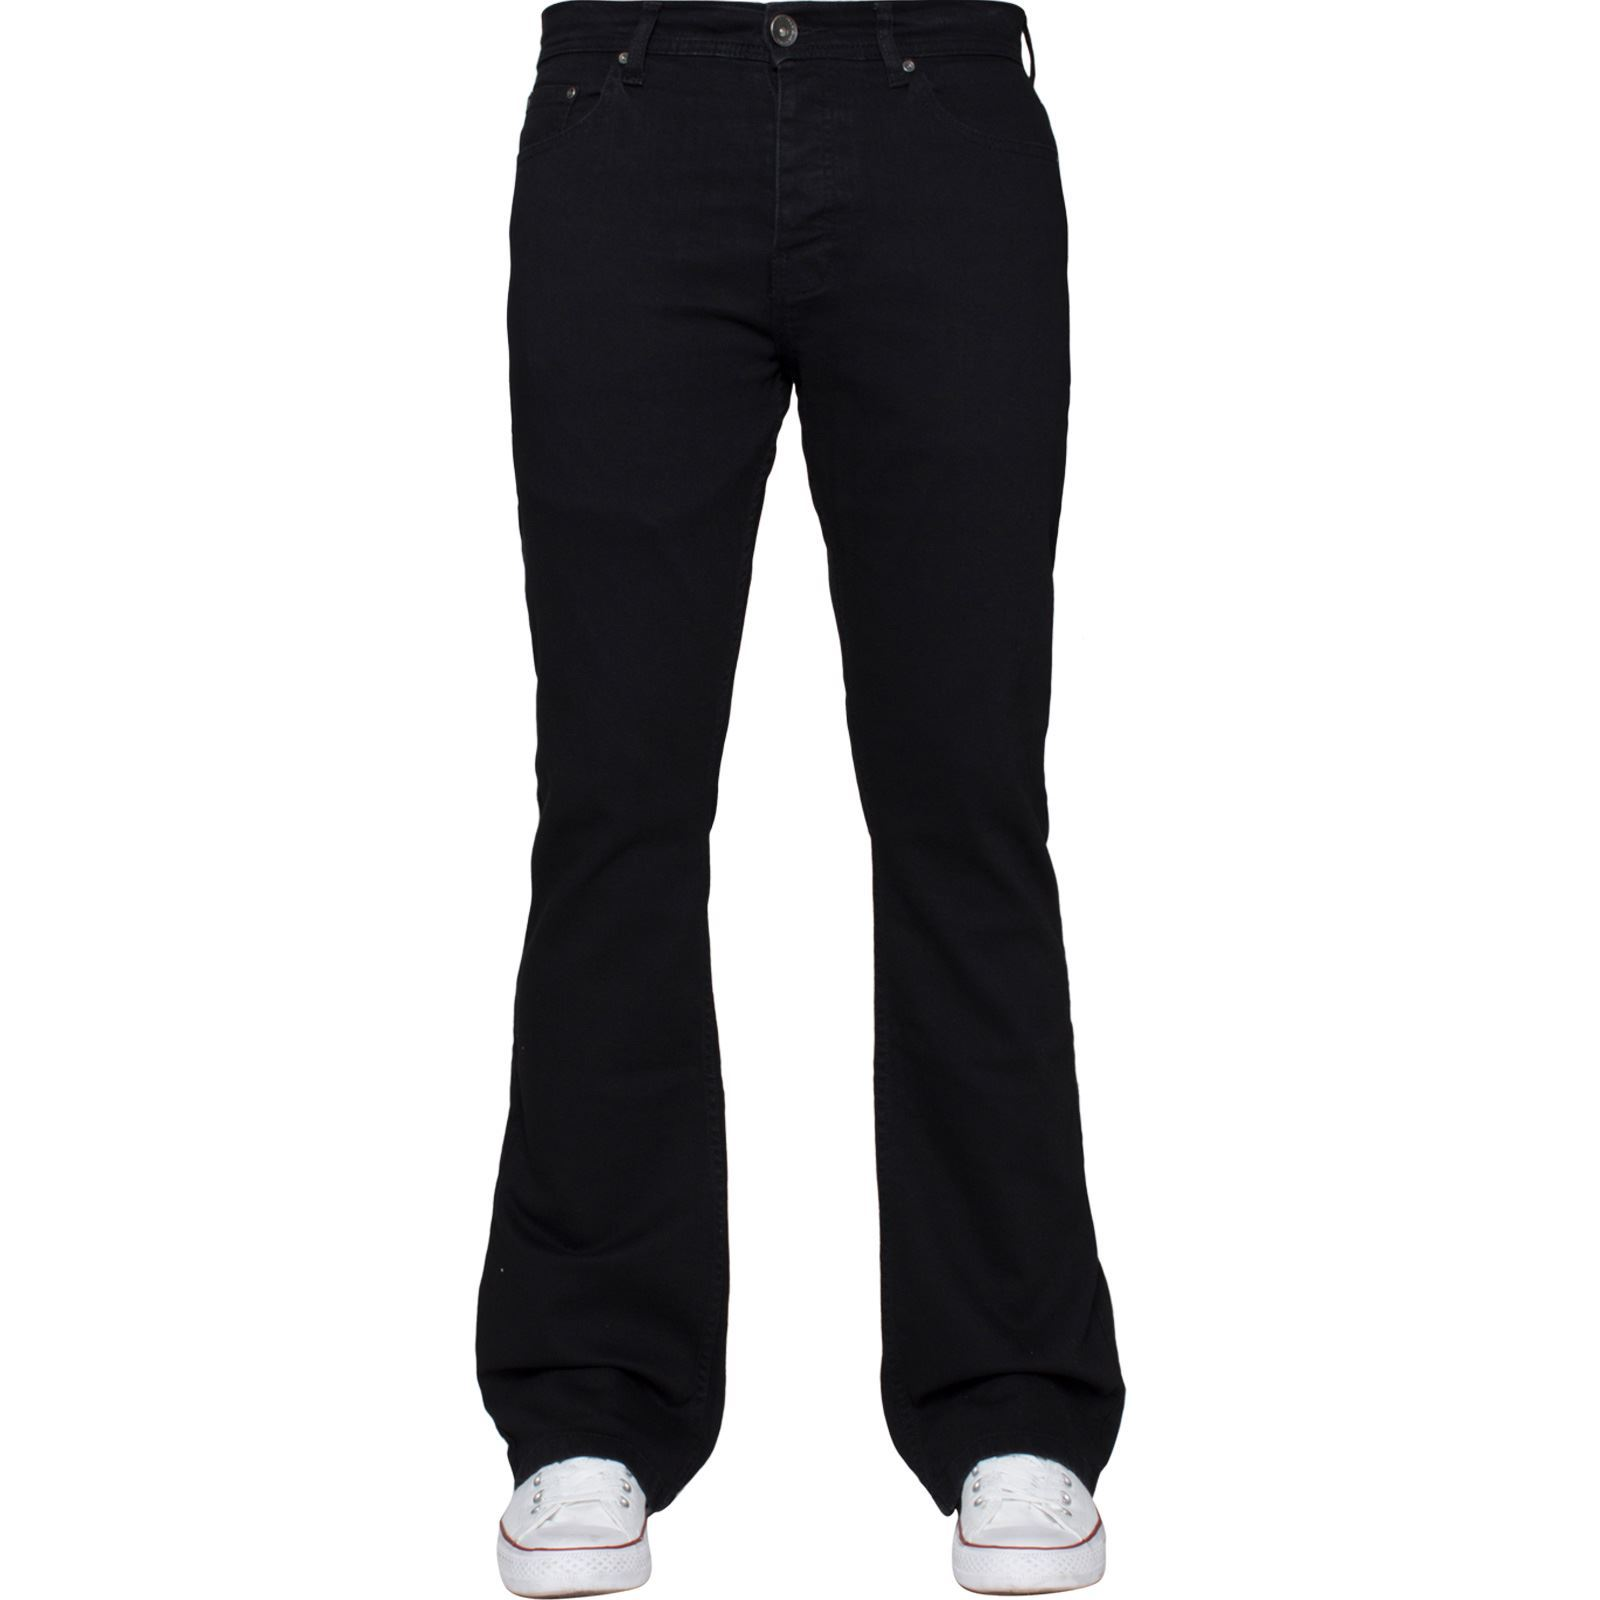 Para-Hombre-Pierna-Recta-Bootcut-Stretch-Denim-Regulares-Pantalon-de-trabajo-Kruze-Todas-Cinturas miniatura 66